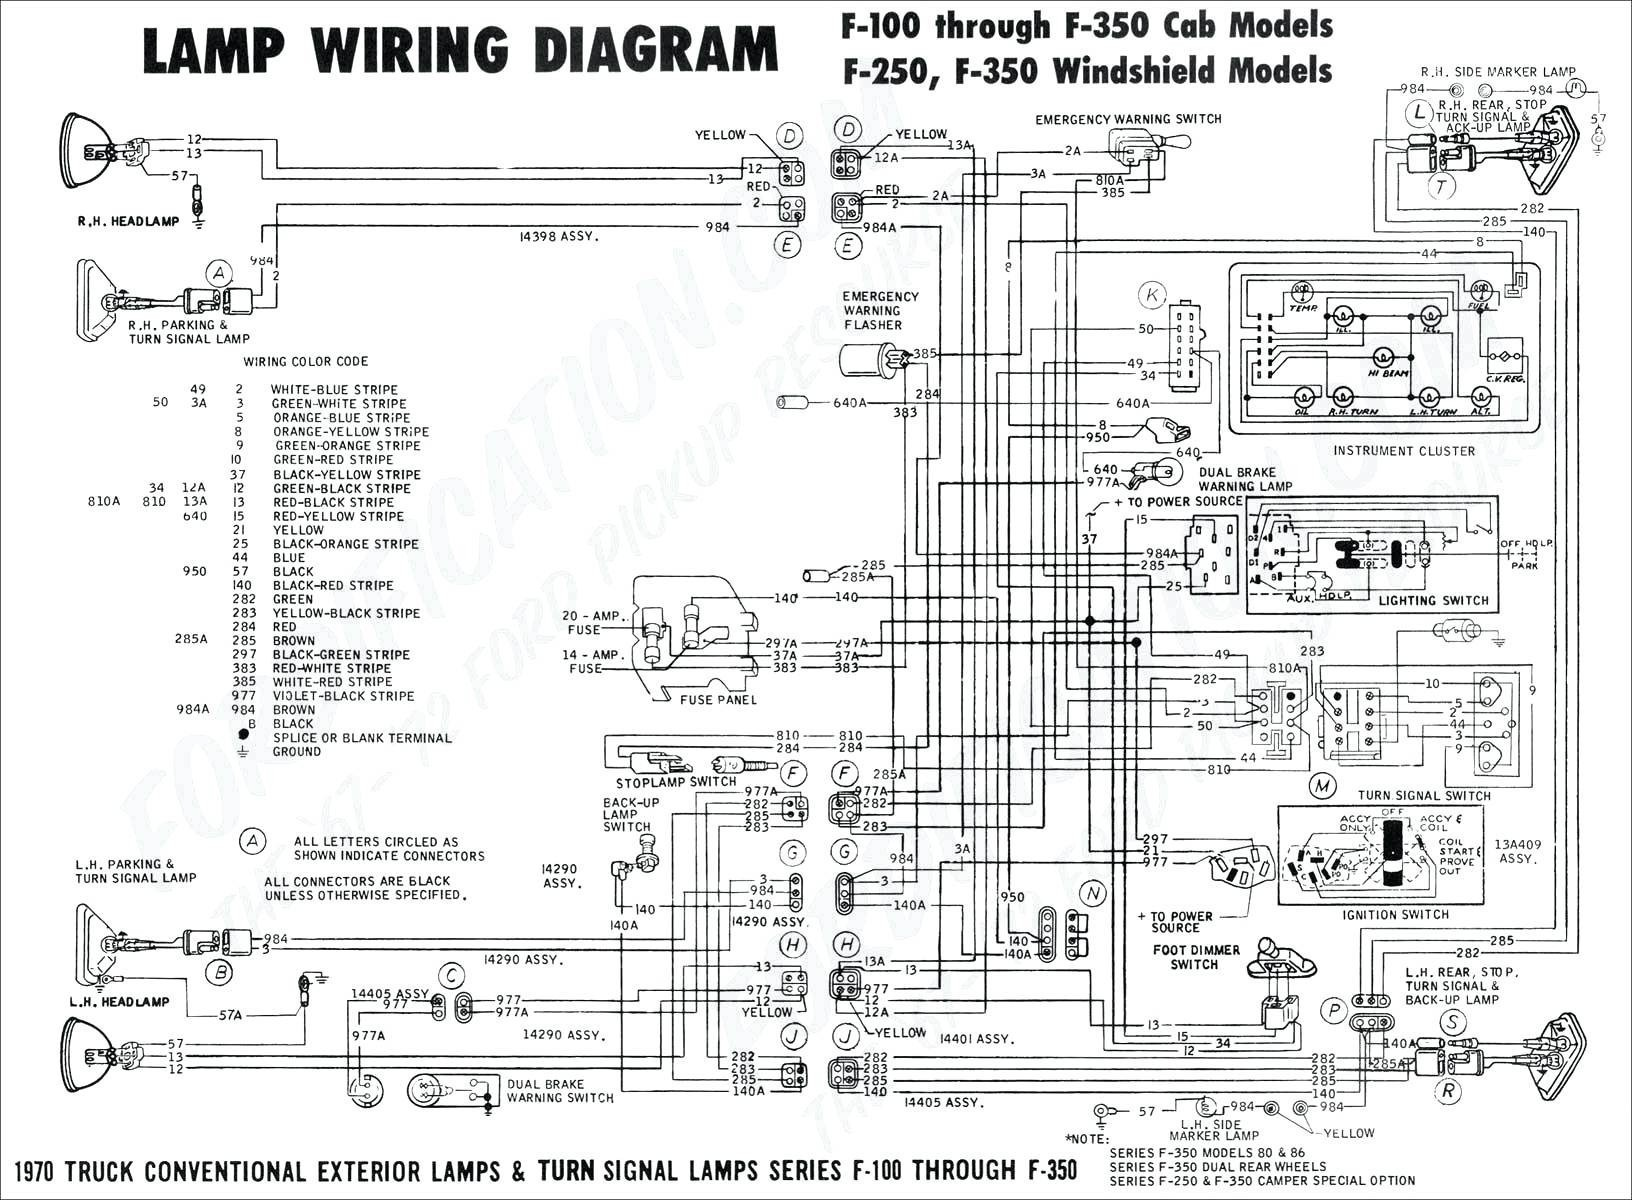 Wireless Remote Control Car Circuit Diagram Rc Wiring Diagrams 3 Cha Wiring Diagram General Of Wireless Remote Control Car Circuit Diagram